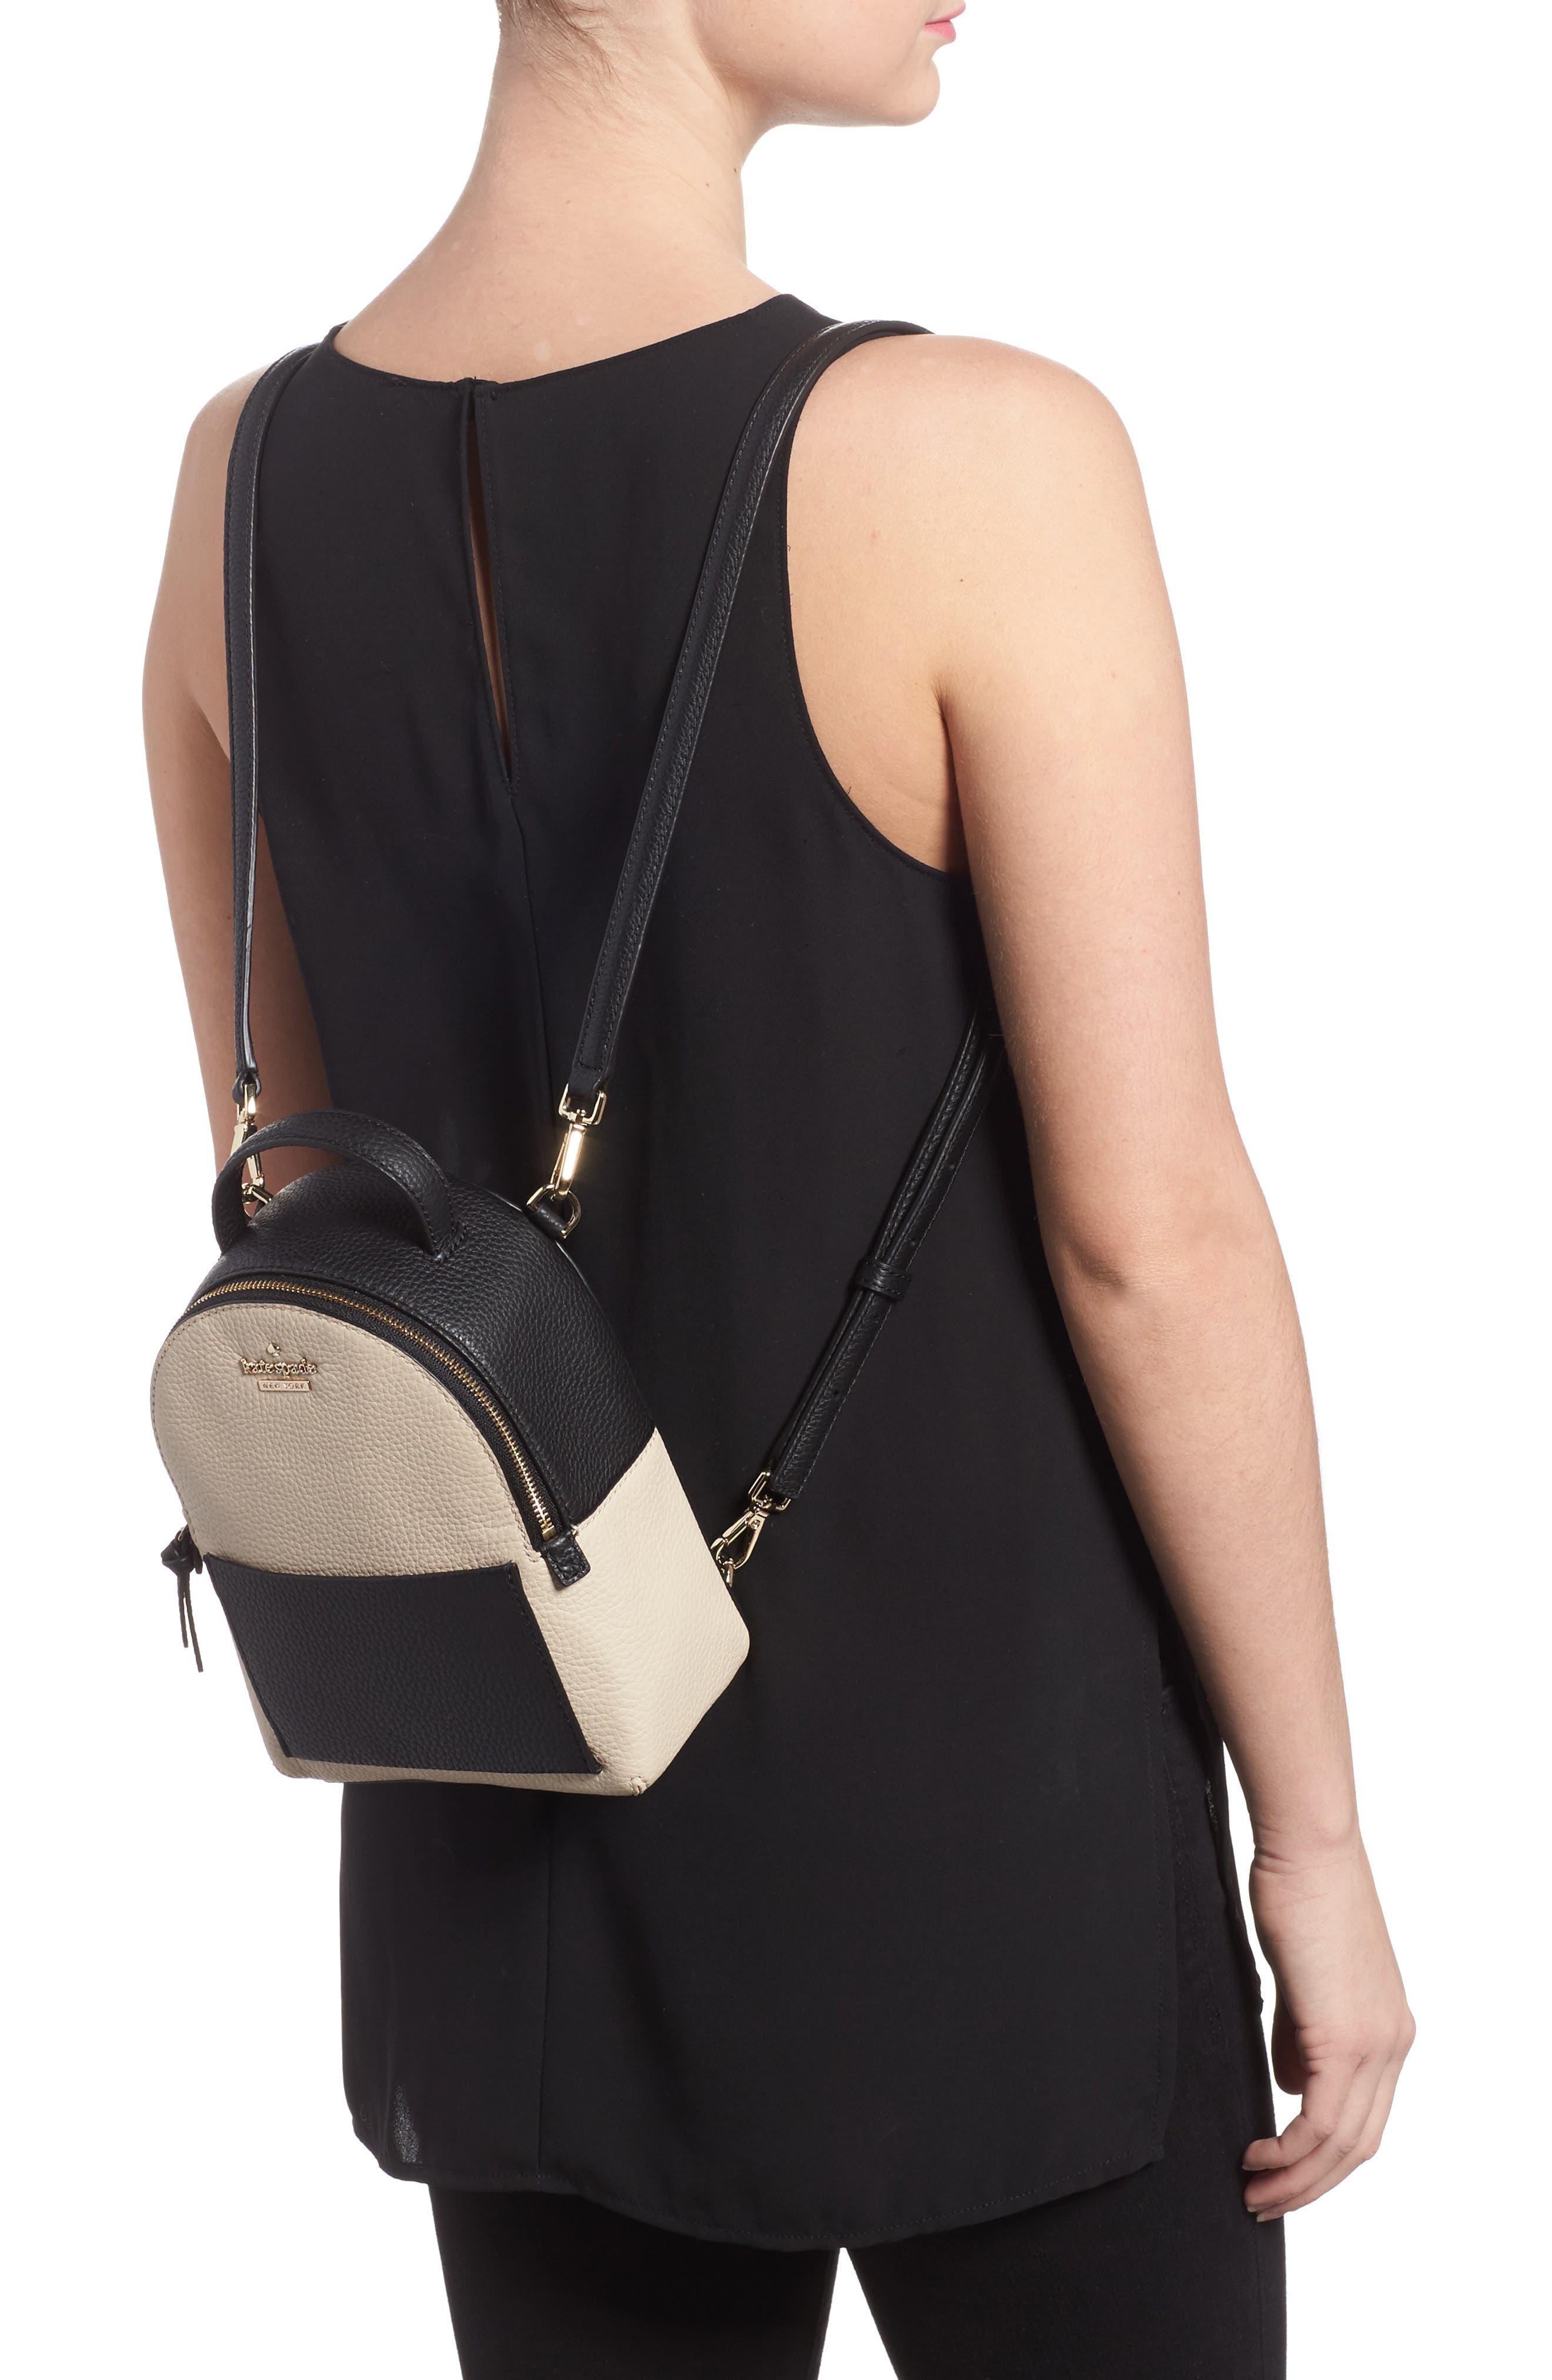 jackson street merry convertible leather backpack,                             Alternate thumbnail 2, color,                             Black/ Soft Porcelain